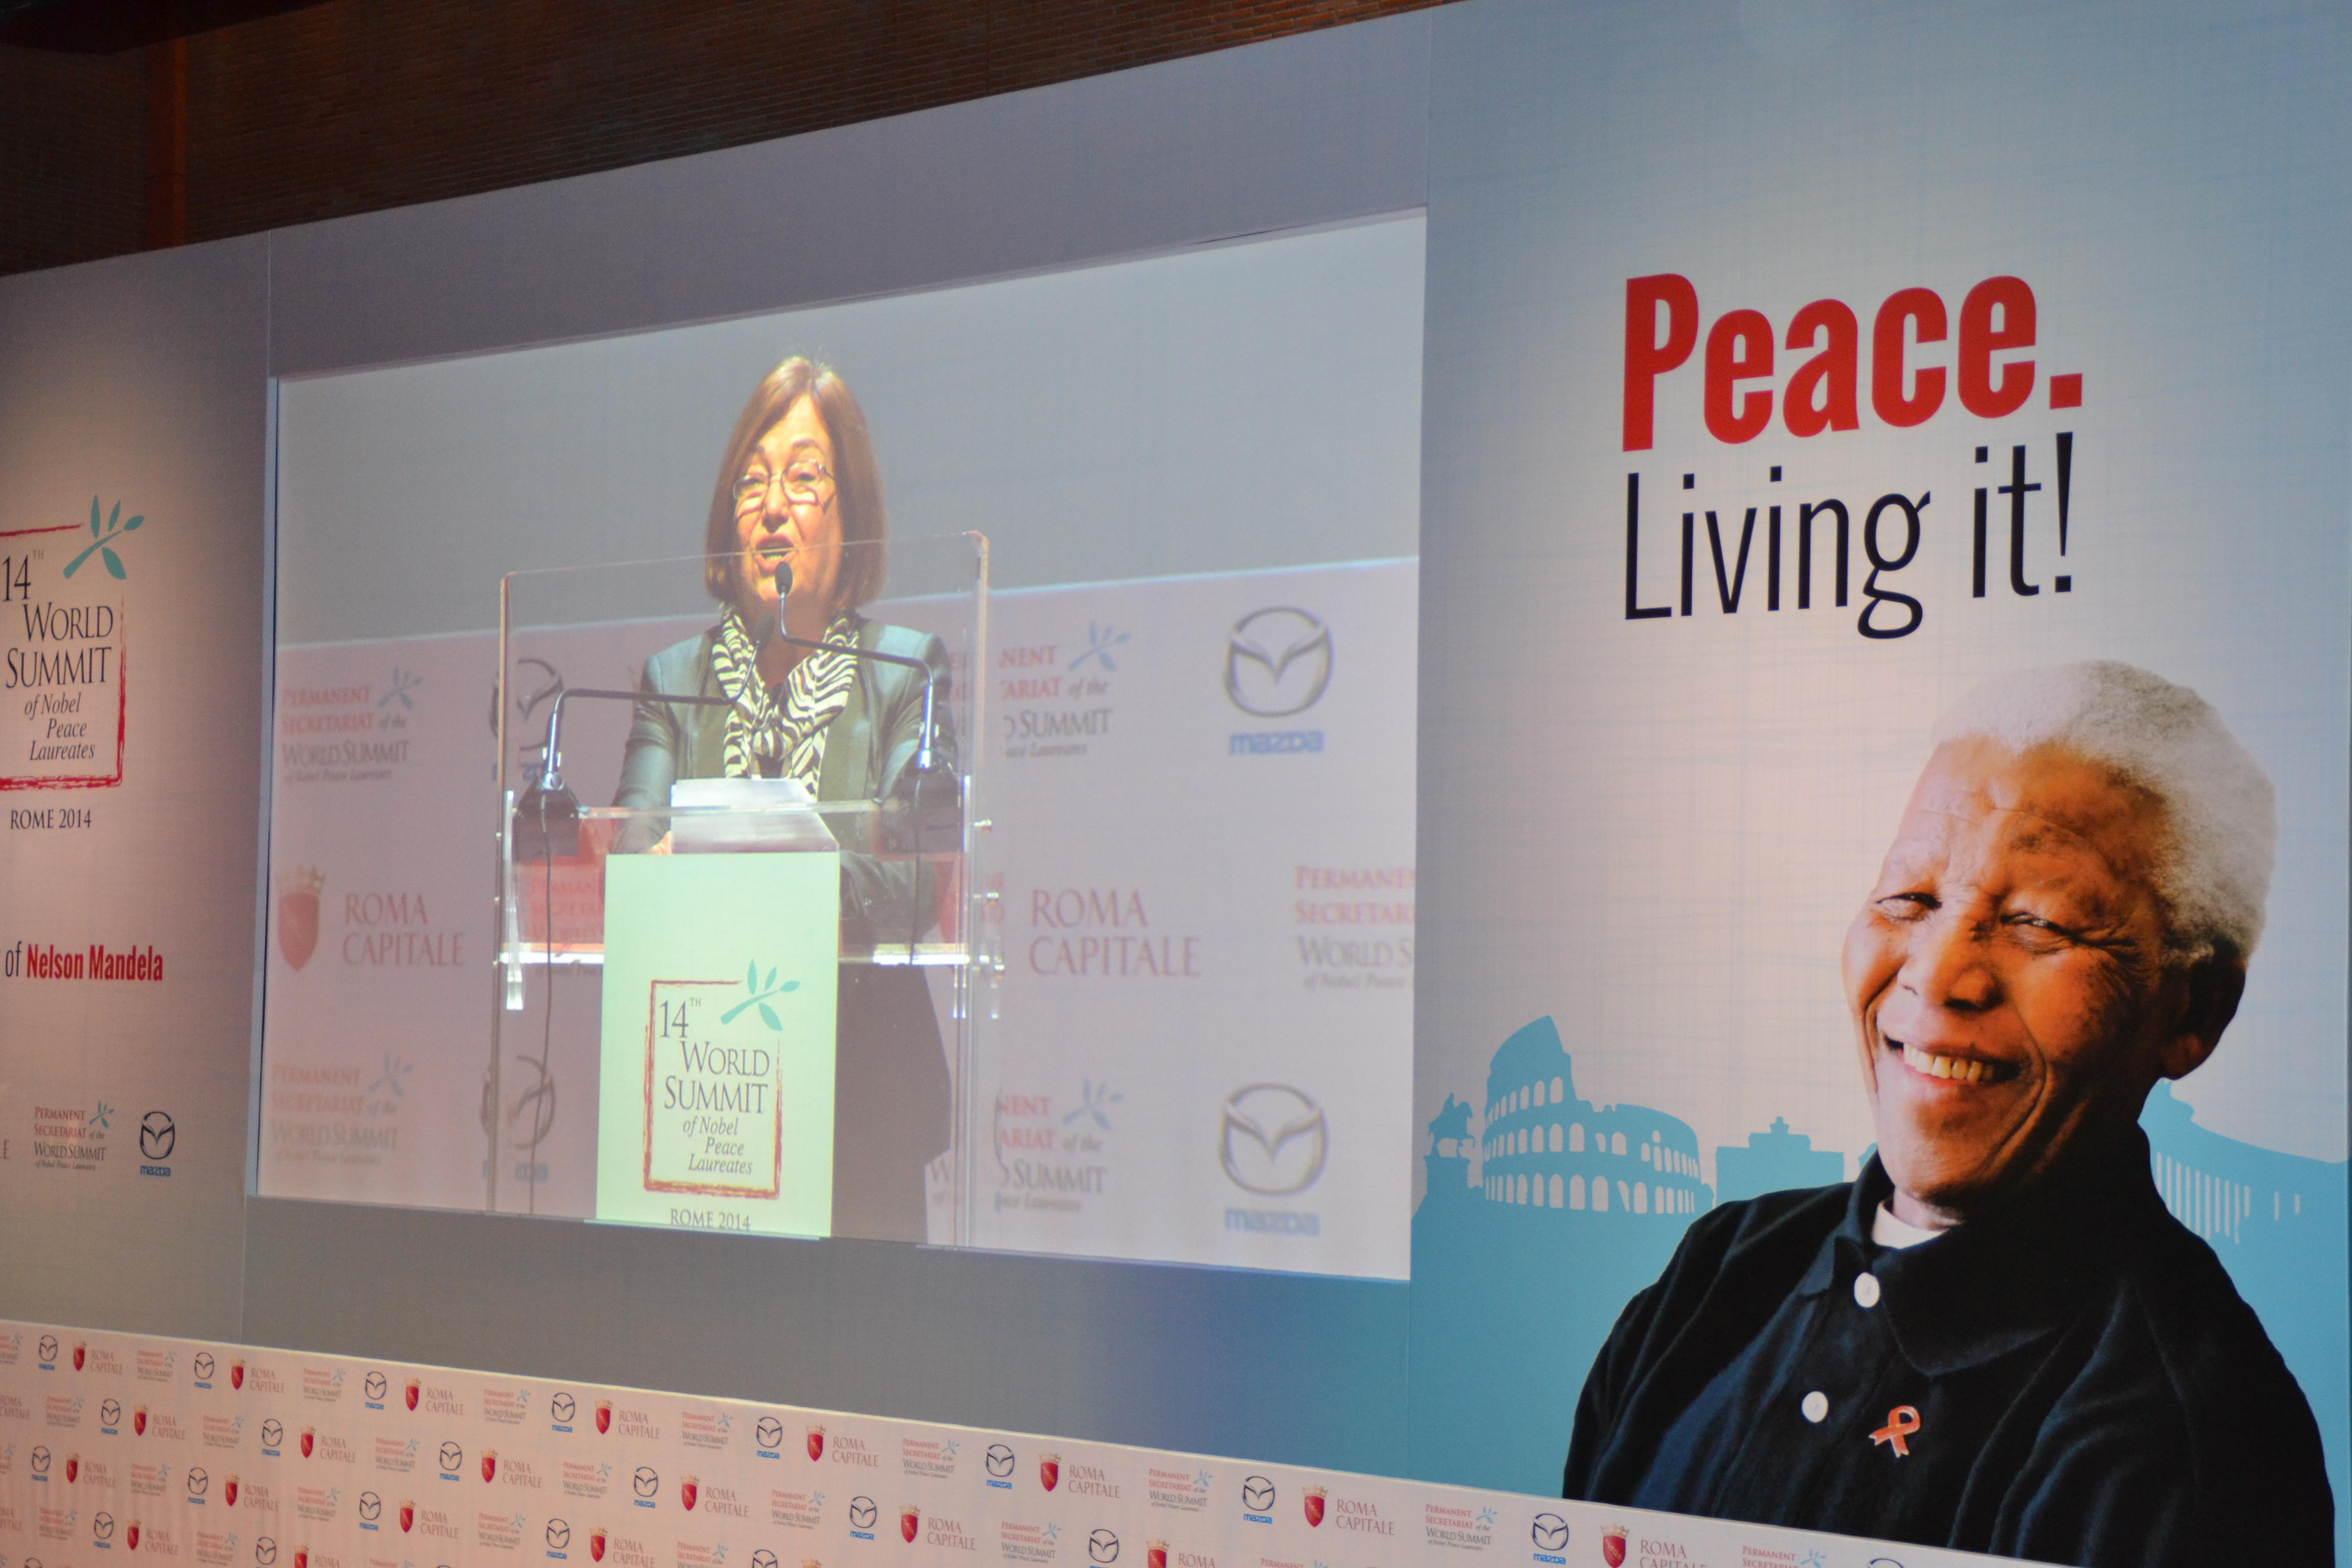 Cumbre de los Nobel: entrevista a Mairead Maguire